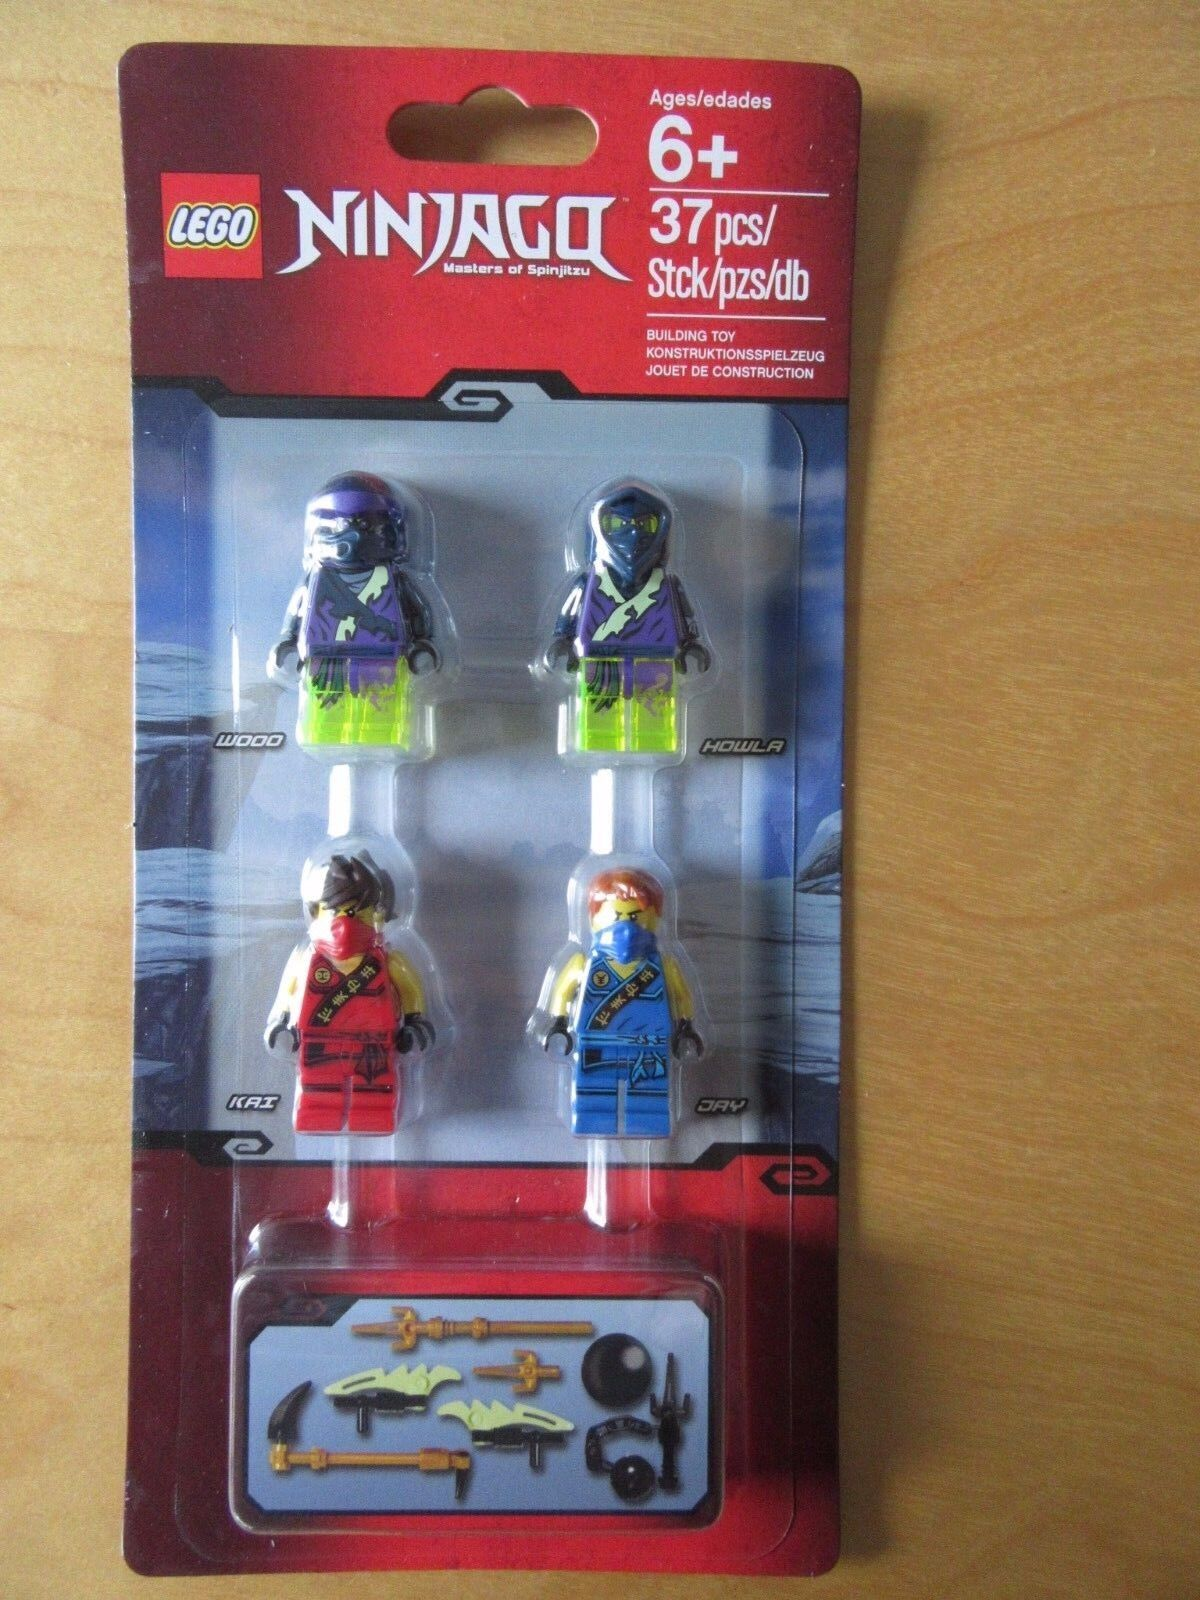 New New New in Manufacturer Sealed LEGO® Ninjago™ Minifigure Set 485e72